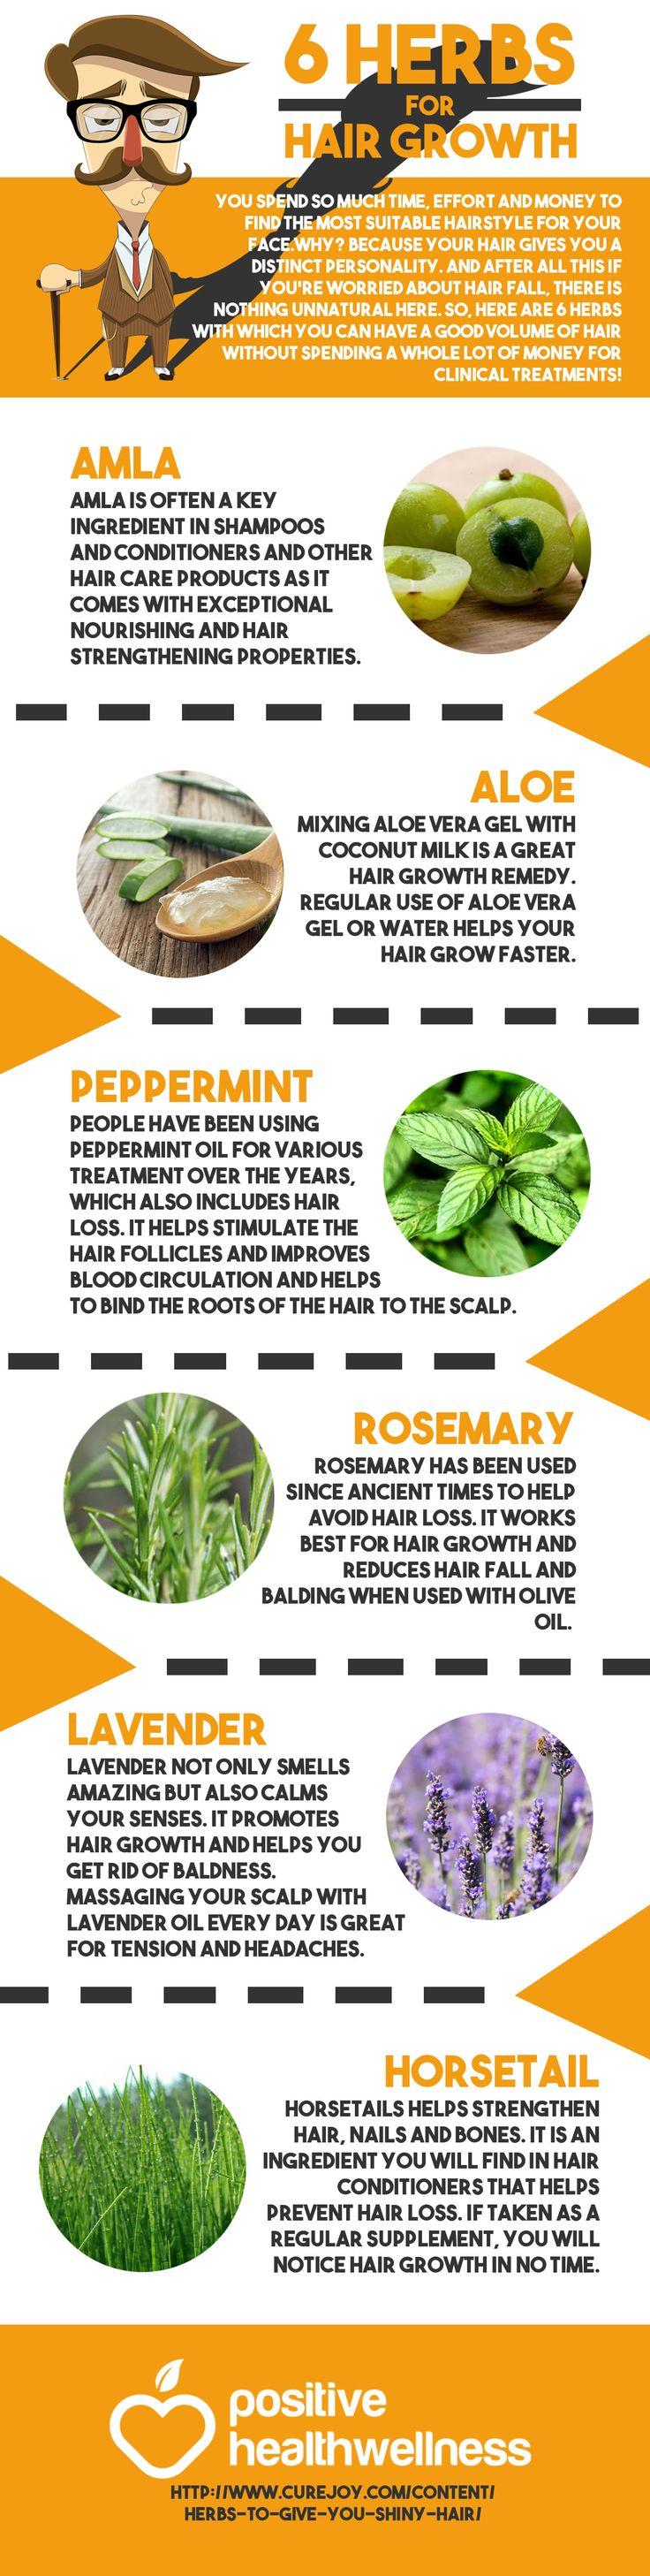 6 Herbs for Hair Growth – Positive Health Wellness Infographic